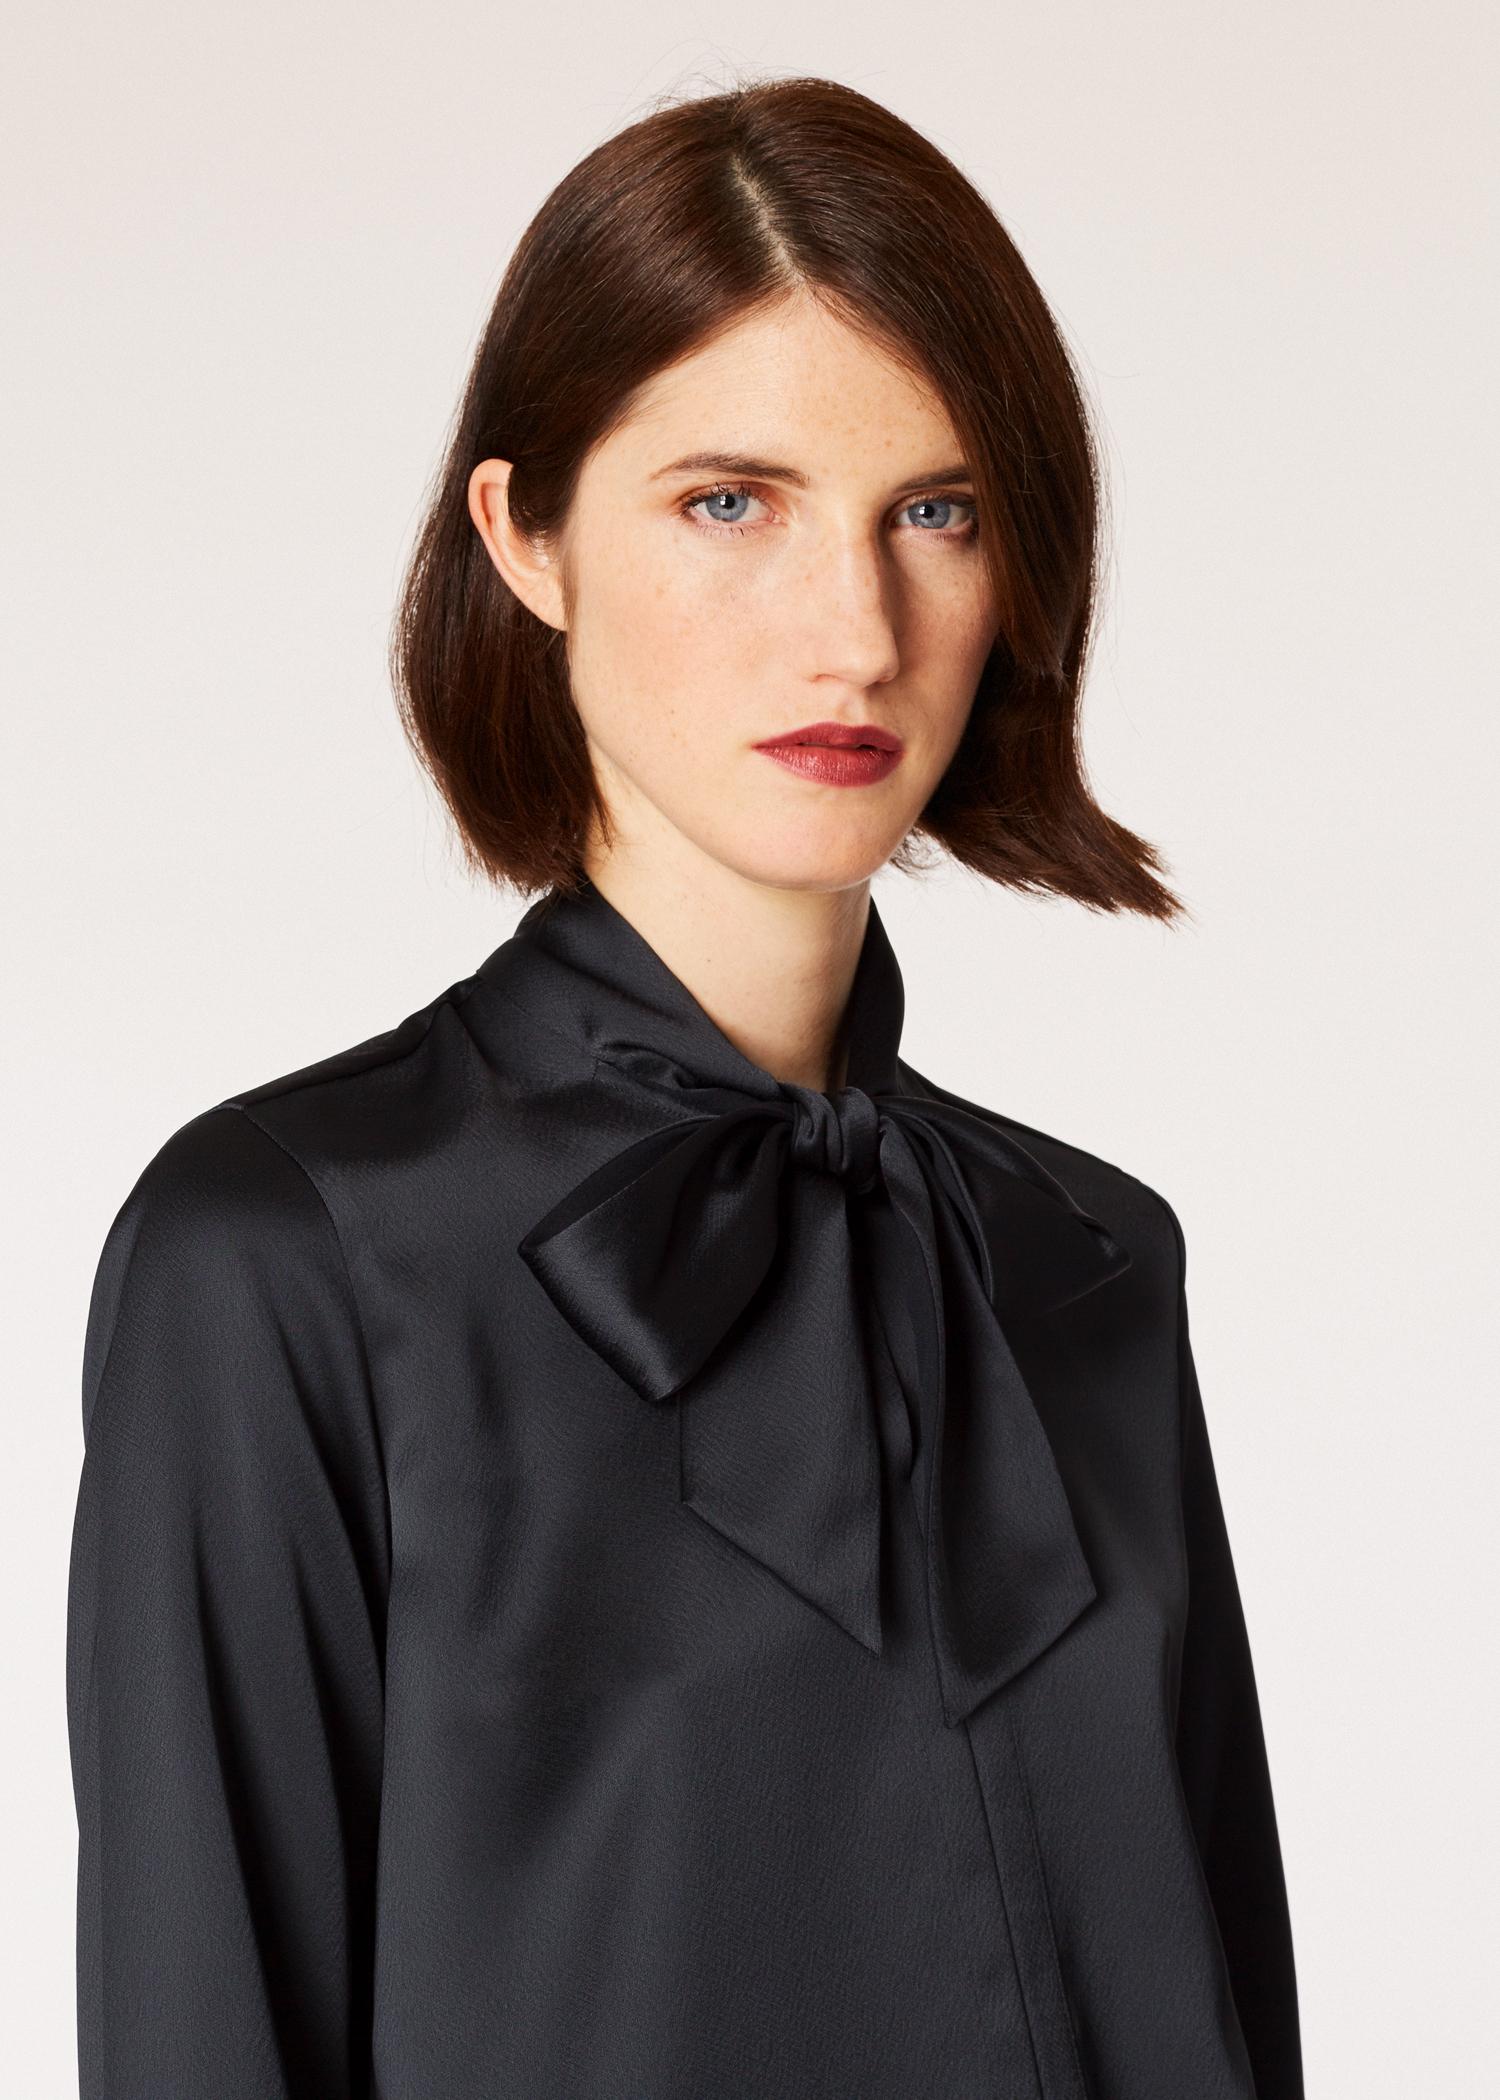 73b8fc01e7f7ca Model front close up - Women's Black Satin Tuxedo Shirt Paul Smith